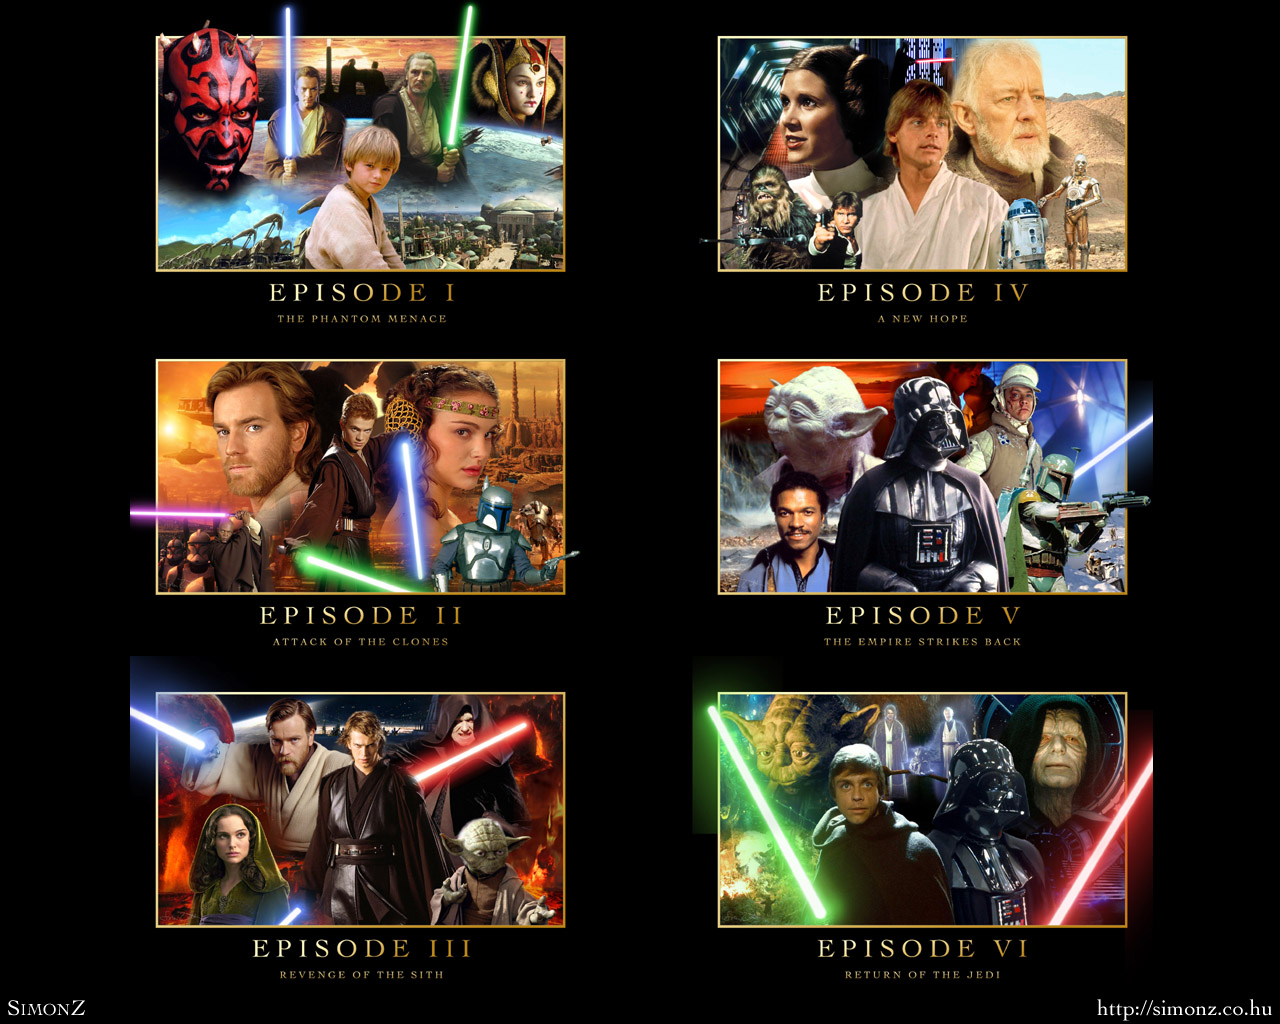 More Star Wars Saga Wallpapers   Star Wars Wallpaper 25692050 1280x1024